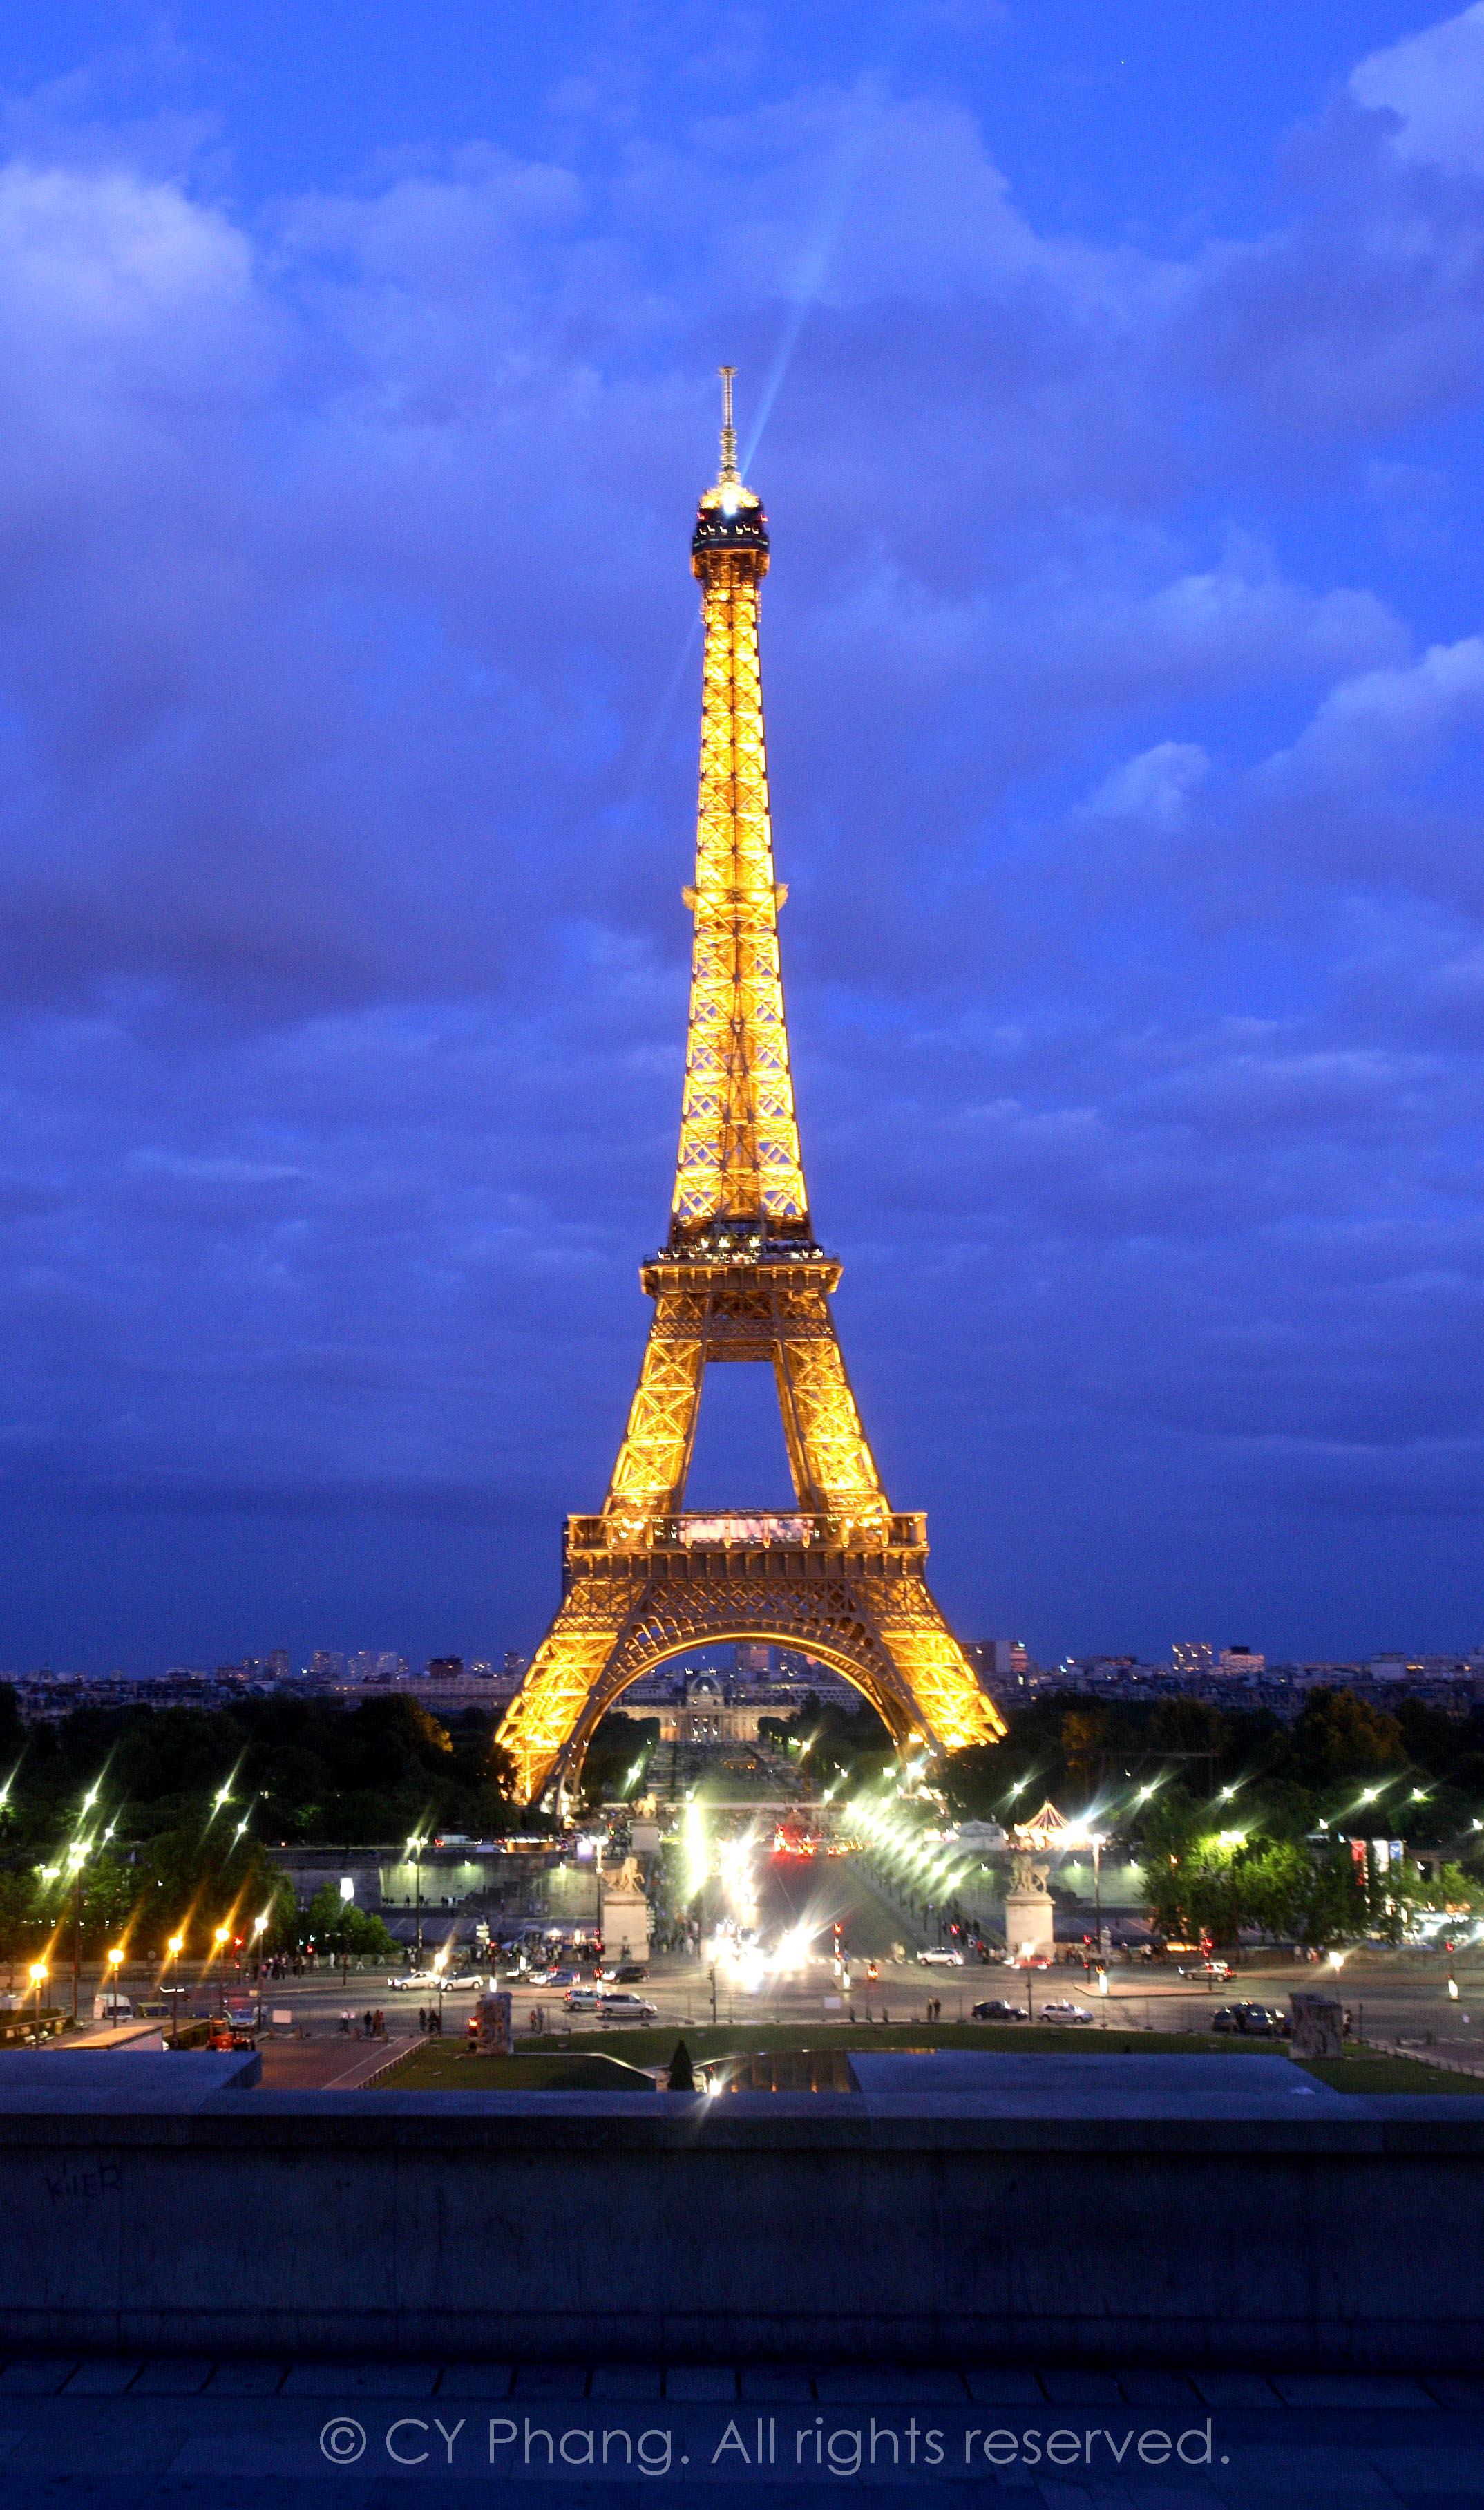 Eiffel tower-IMG_4473-auto-contrast copy